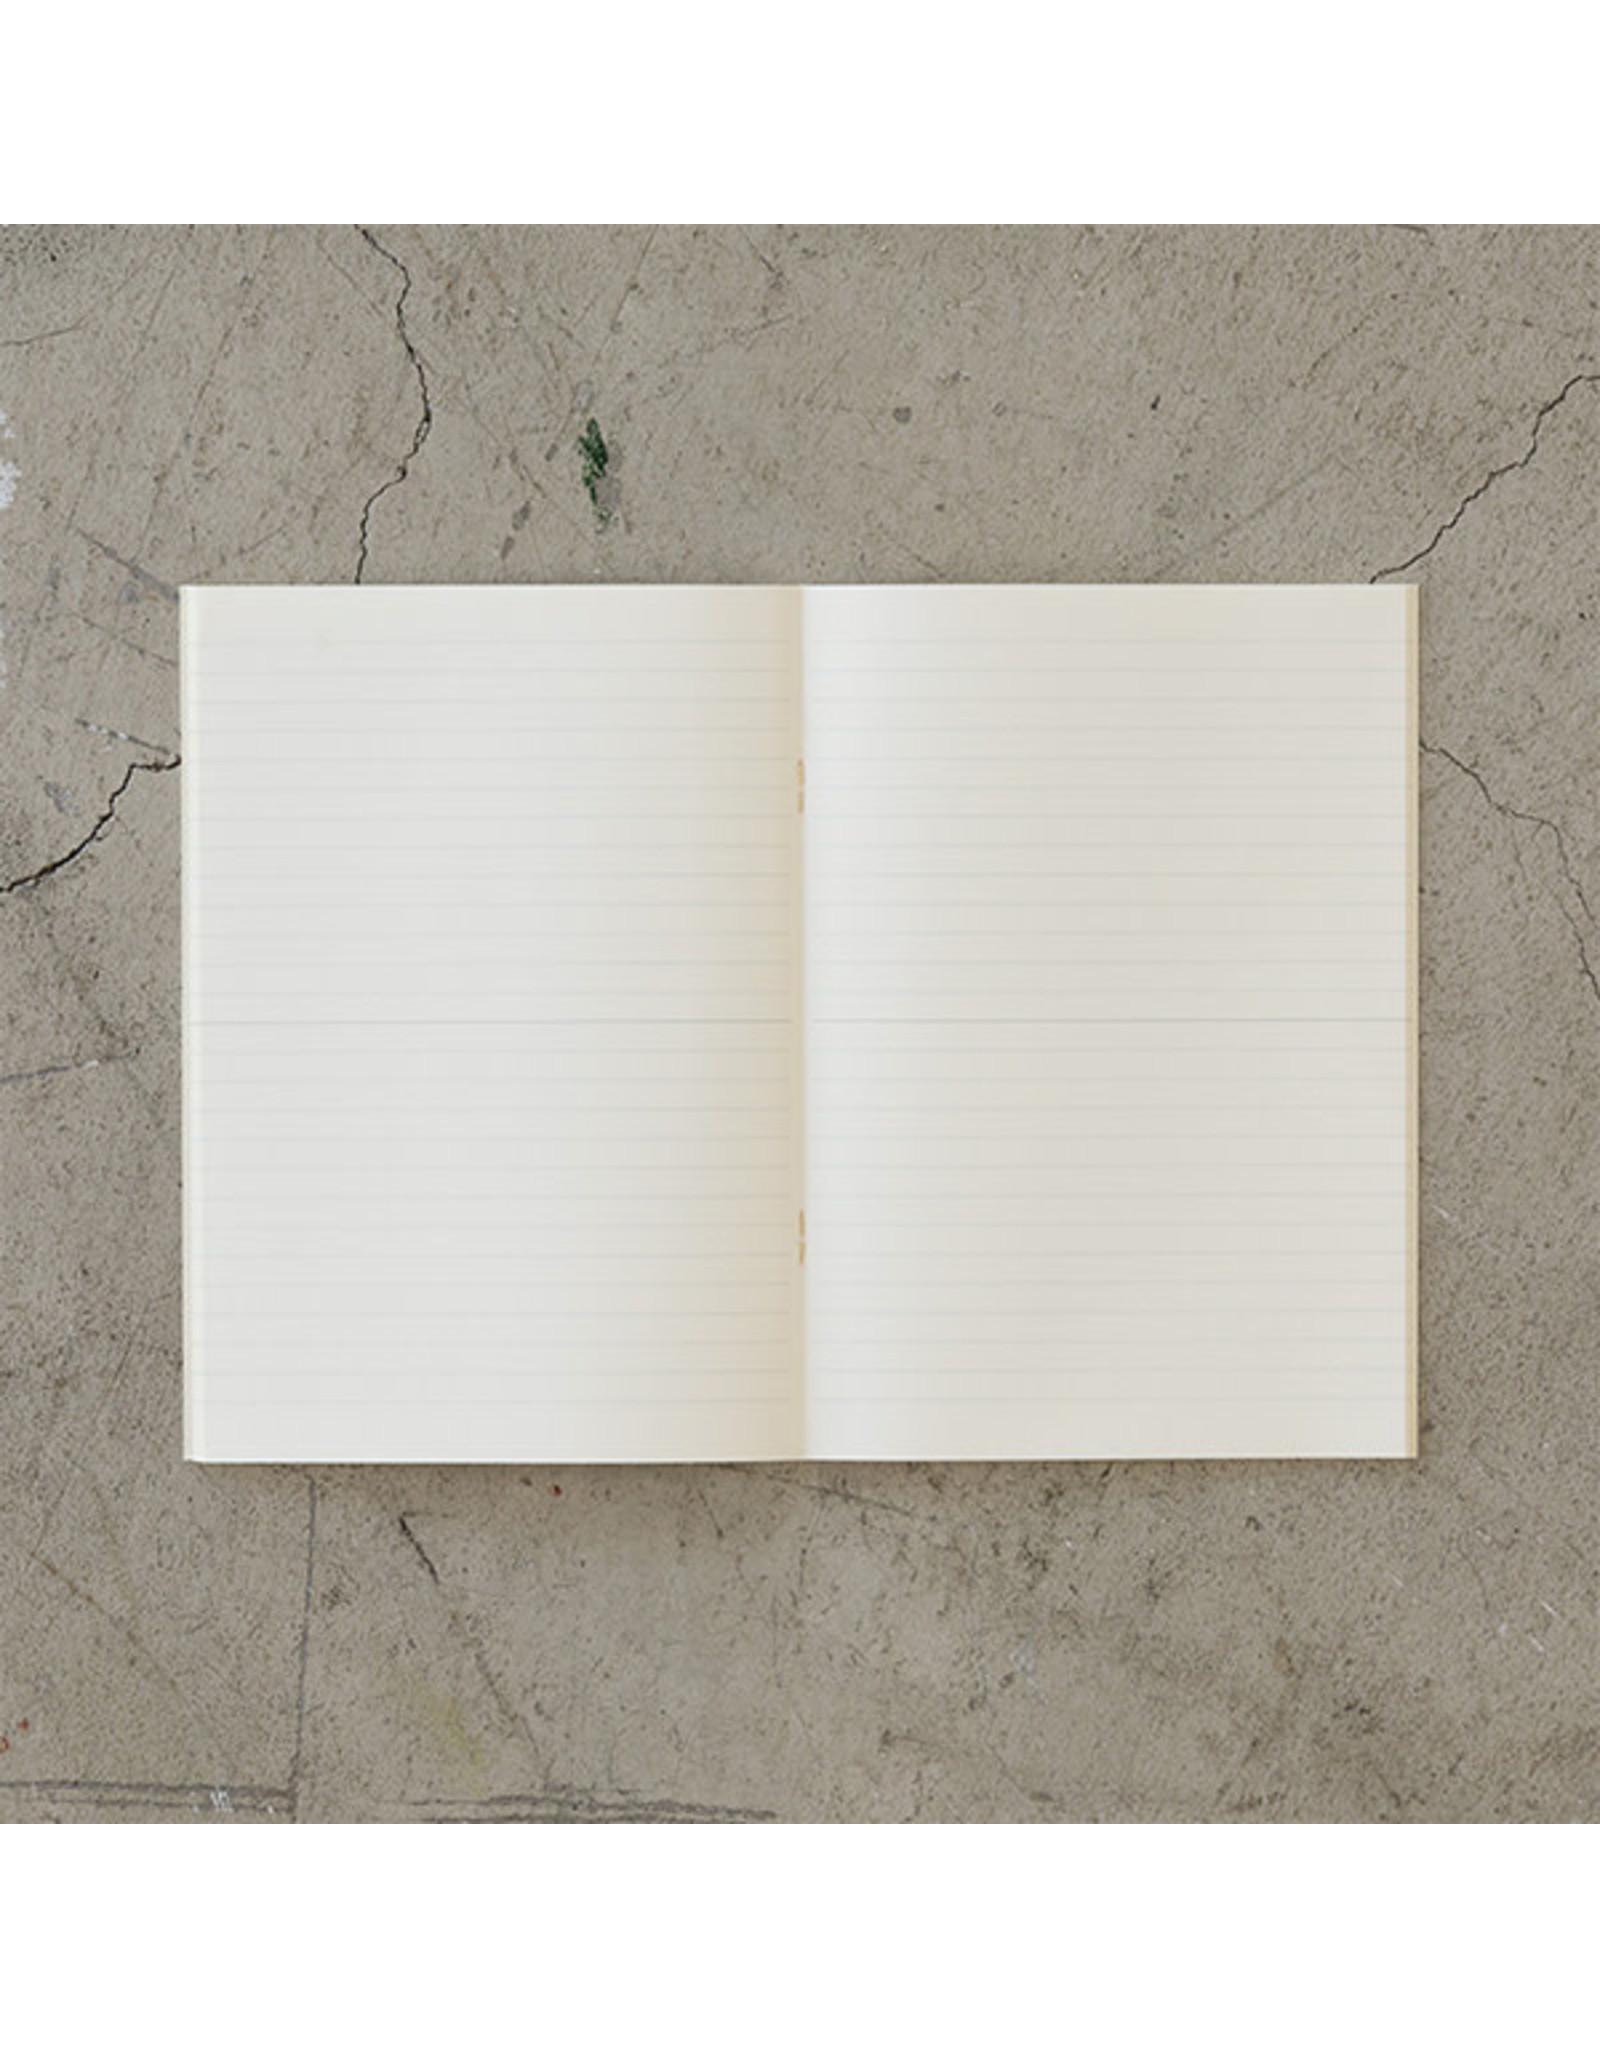 Designphil Inc. MD NOTEBOOK LIGHT  LINED 3PCS PACK A5